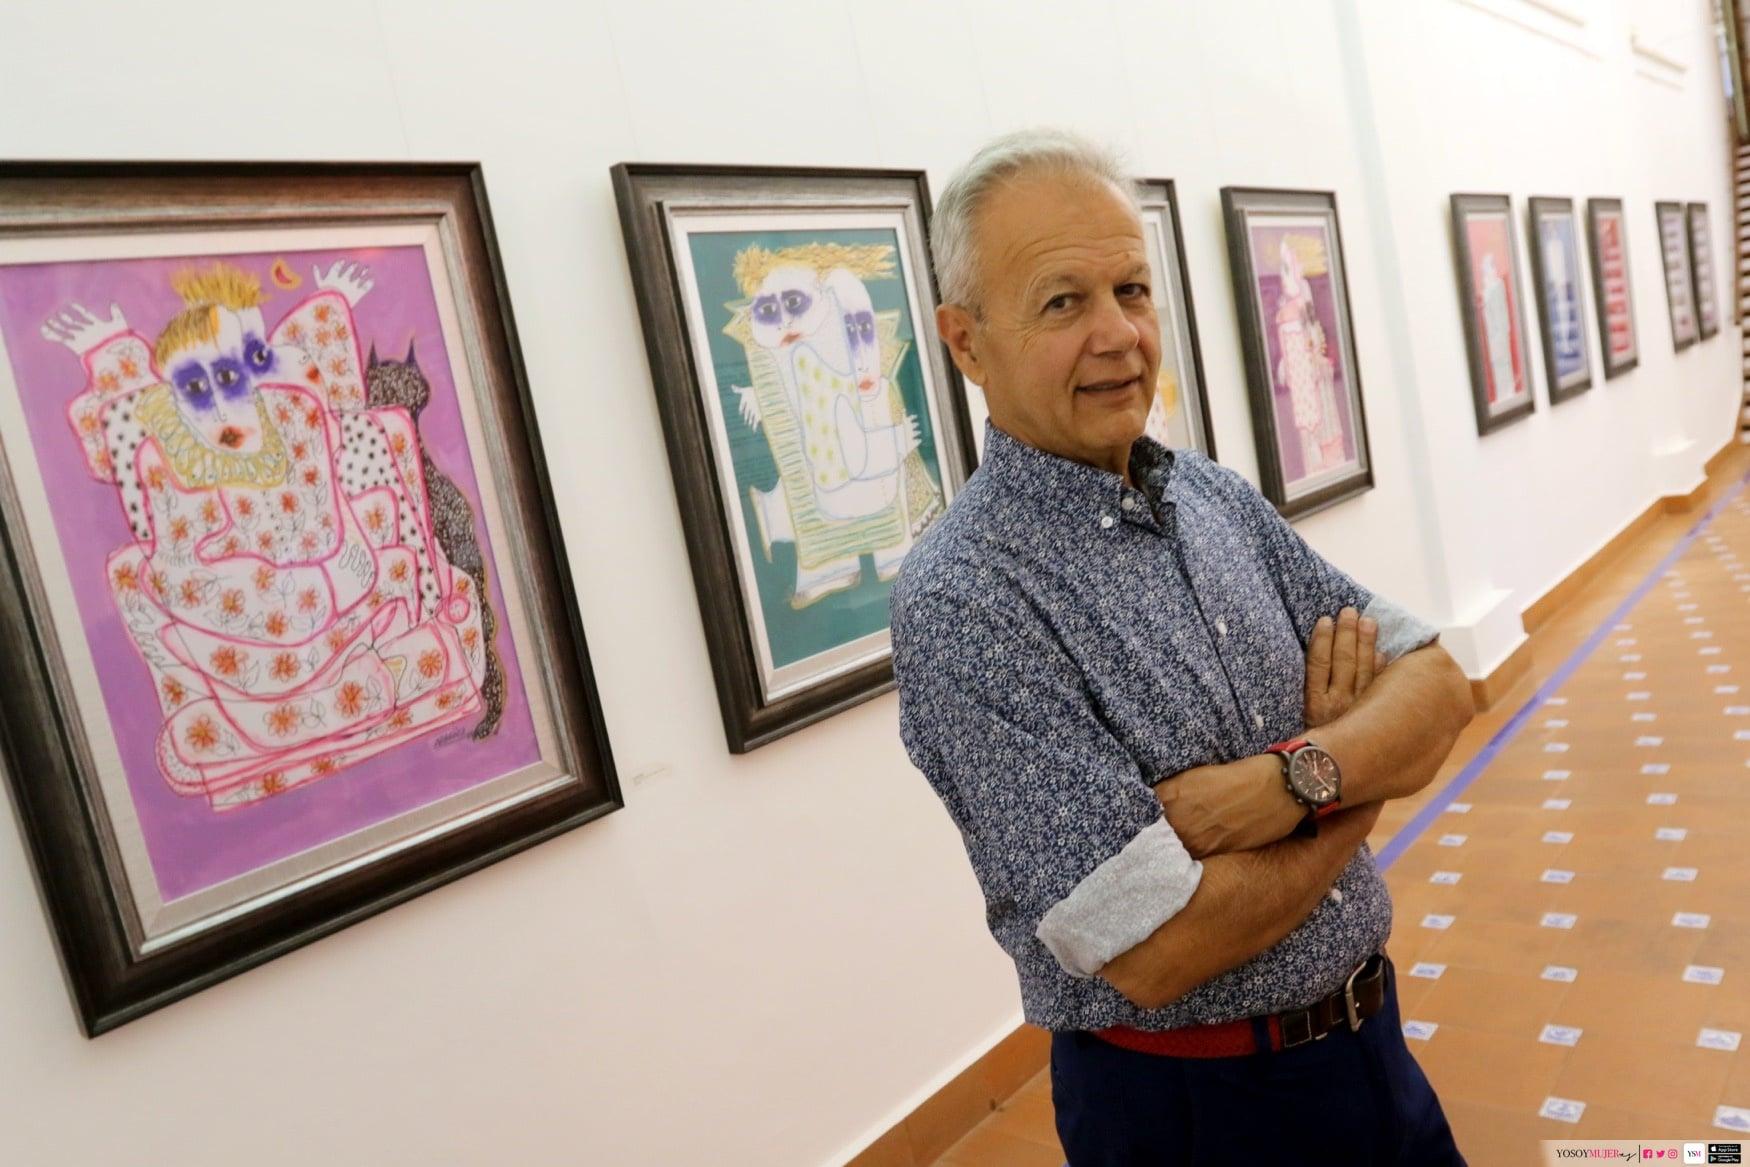 Santiago Fernández Aragüez